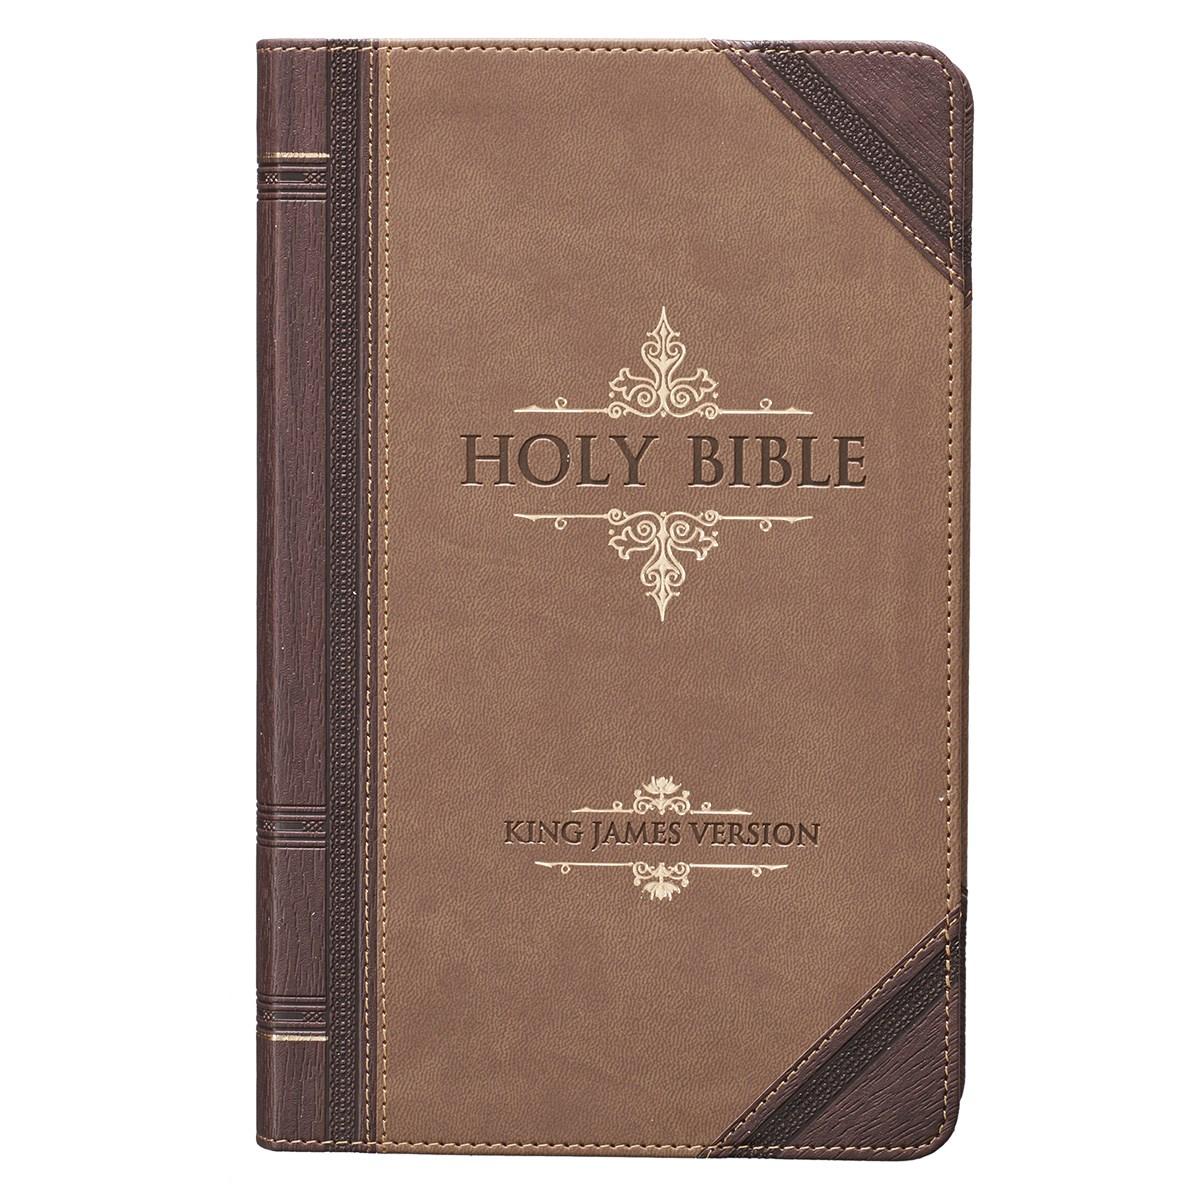 KJV Giant Print Bible-Dark Brown/Tan Portfolio LuxLeather